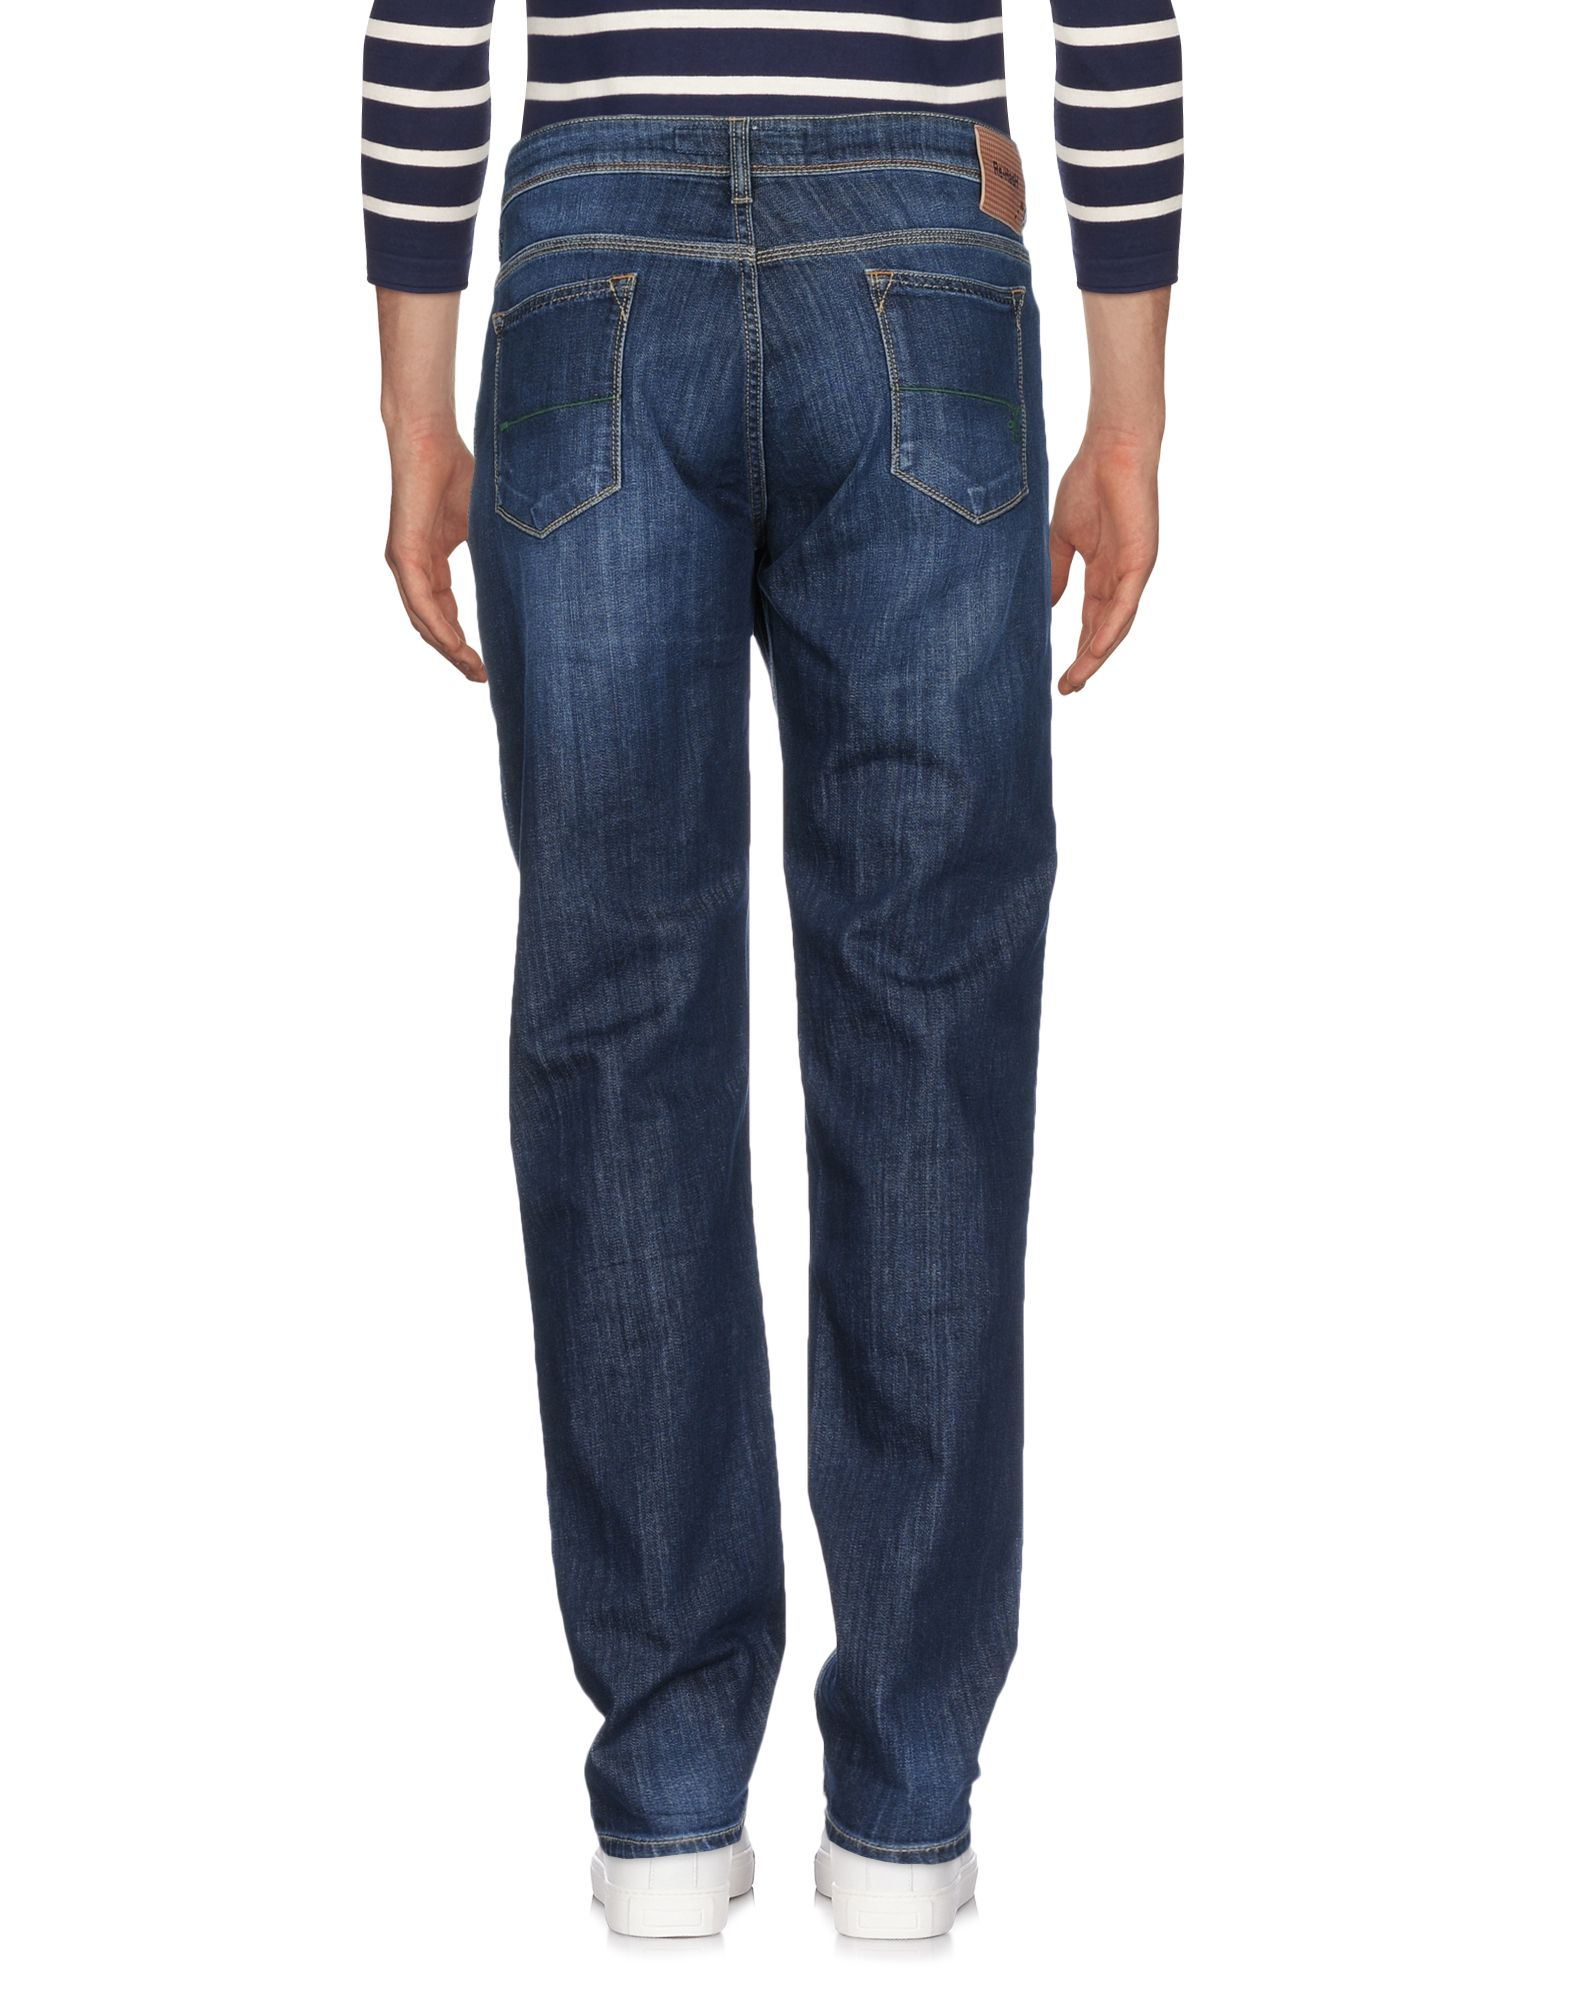 Pantaloni Jeans Uomo Re-Hash Uomo Jeans - 42662893BS 2a5ce5